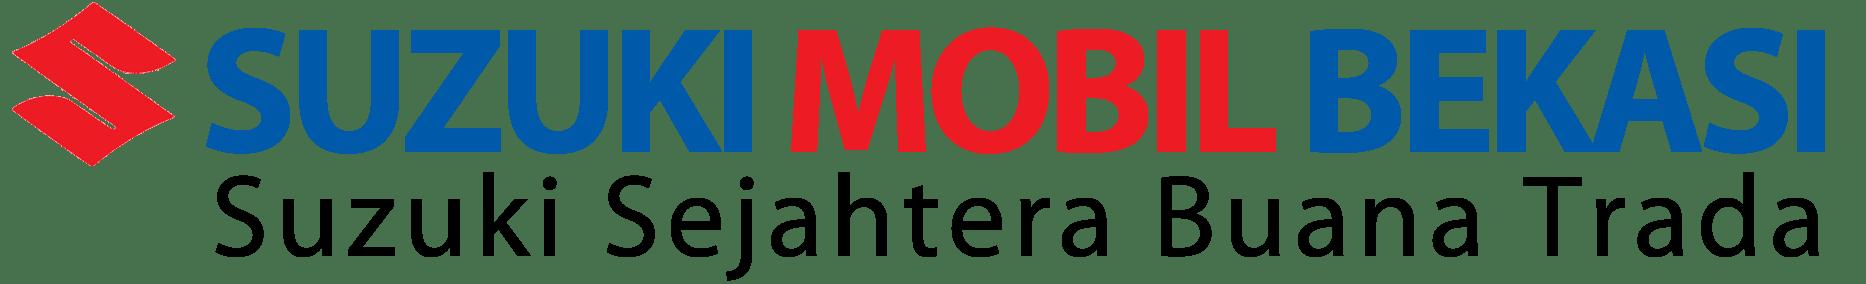 Dealer mobil Suzuki Bekasi | Promo Suzuki Bekasi